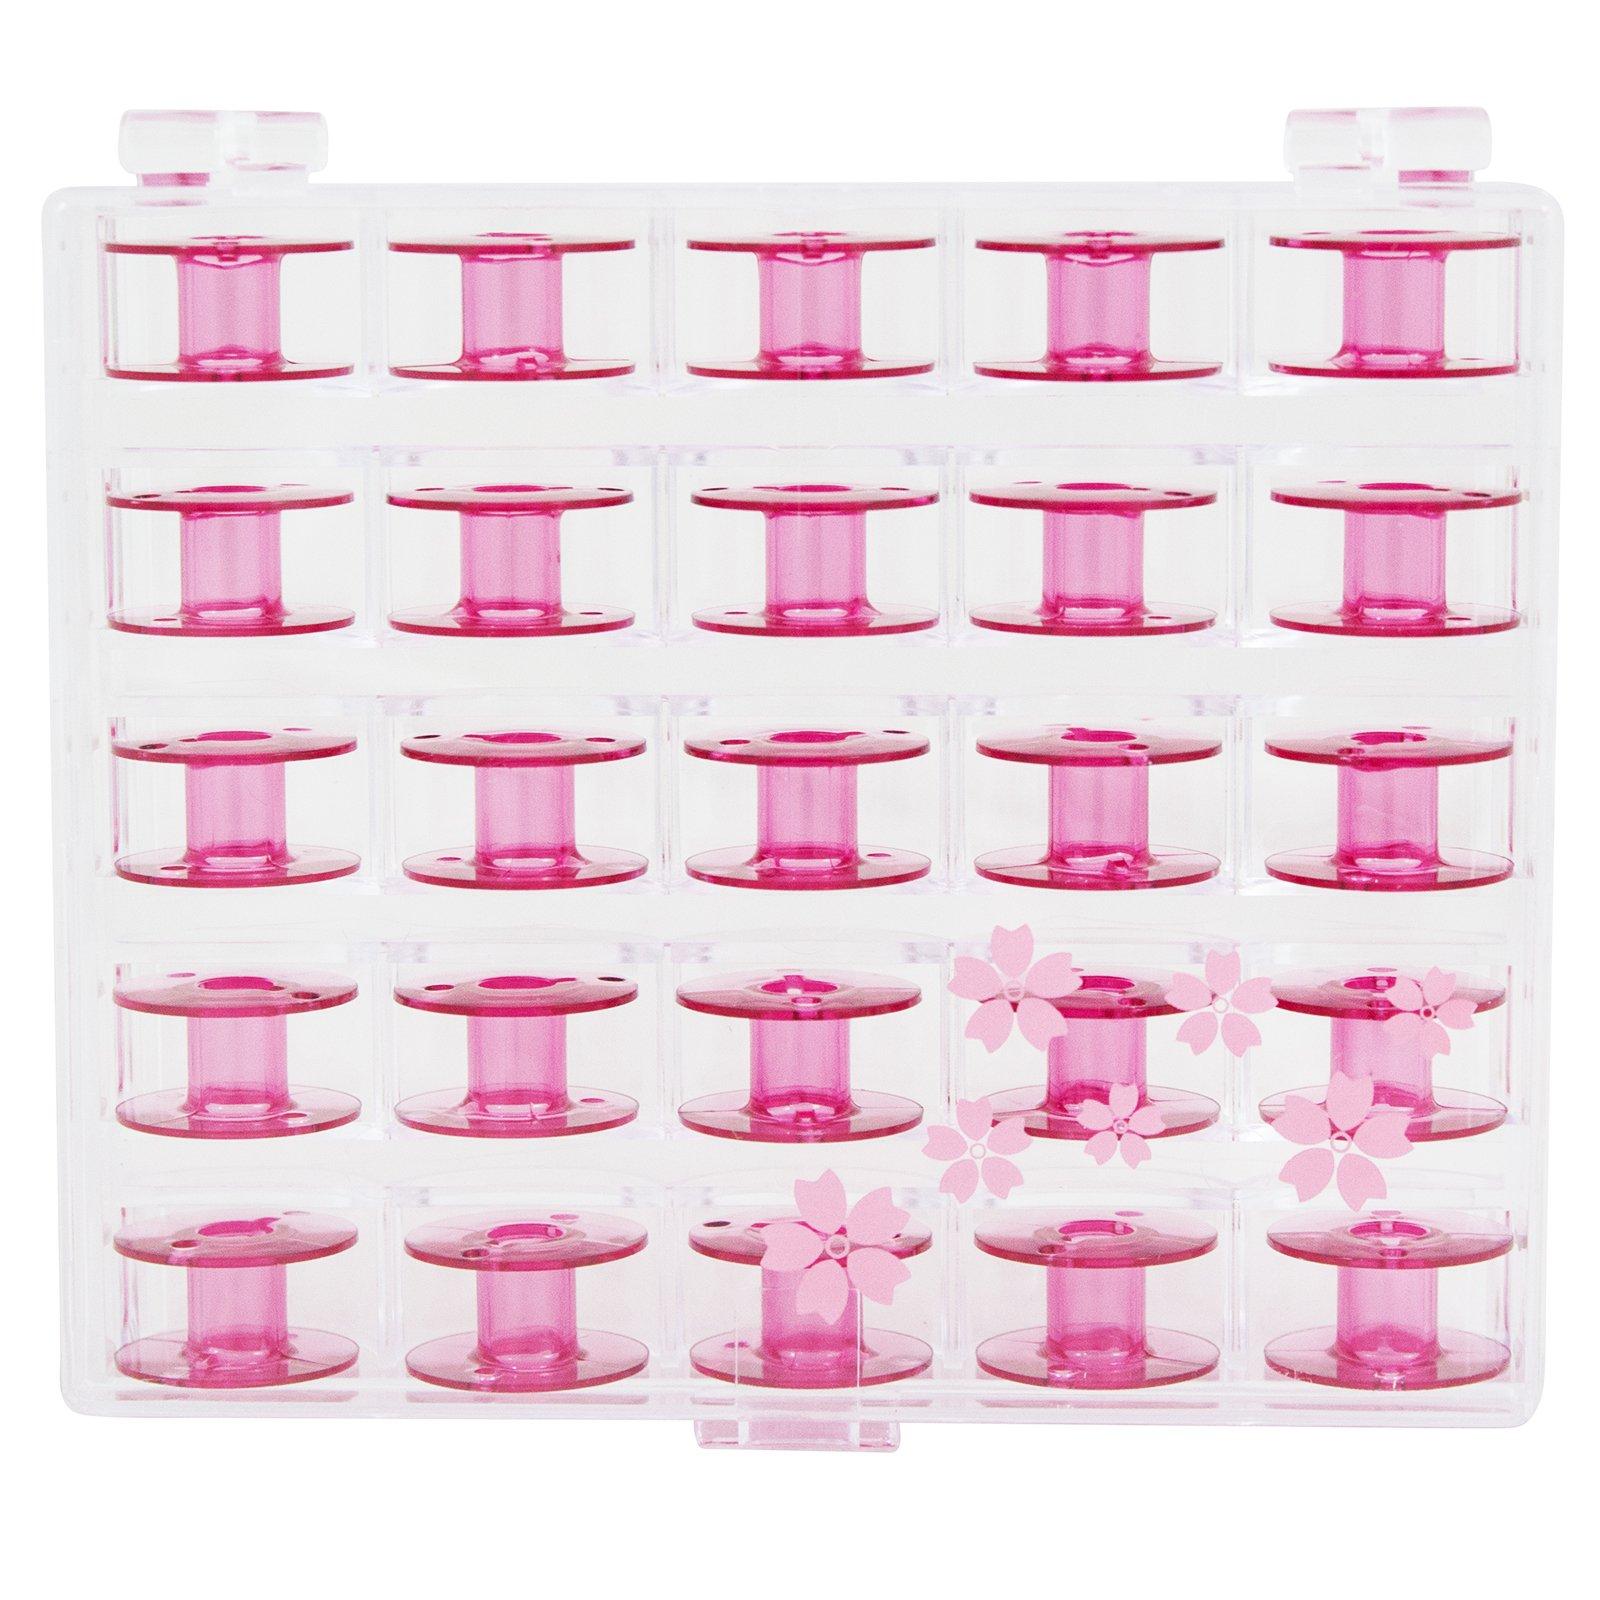 Janome Sewing Machine Cherry Blossom Pink Bobbins 25 ct by Janome